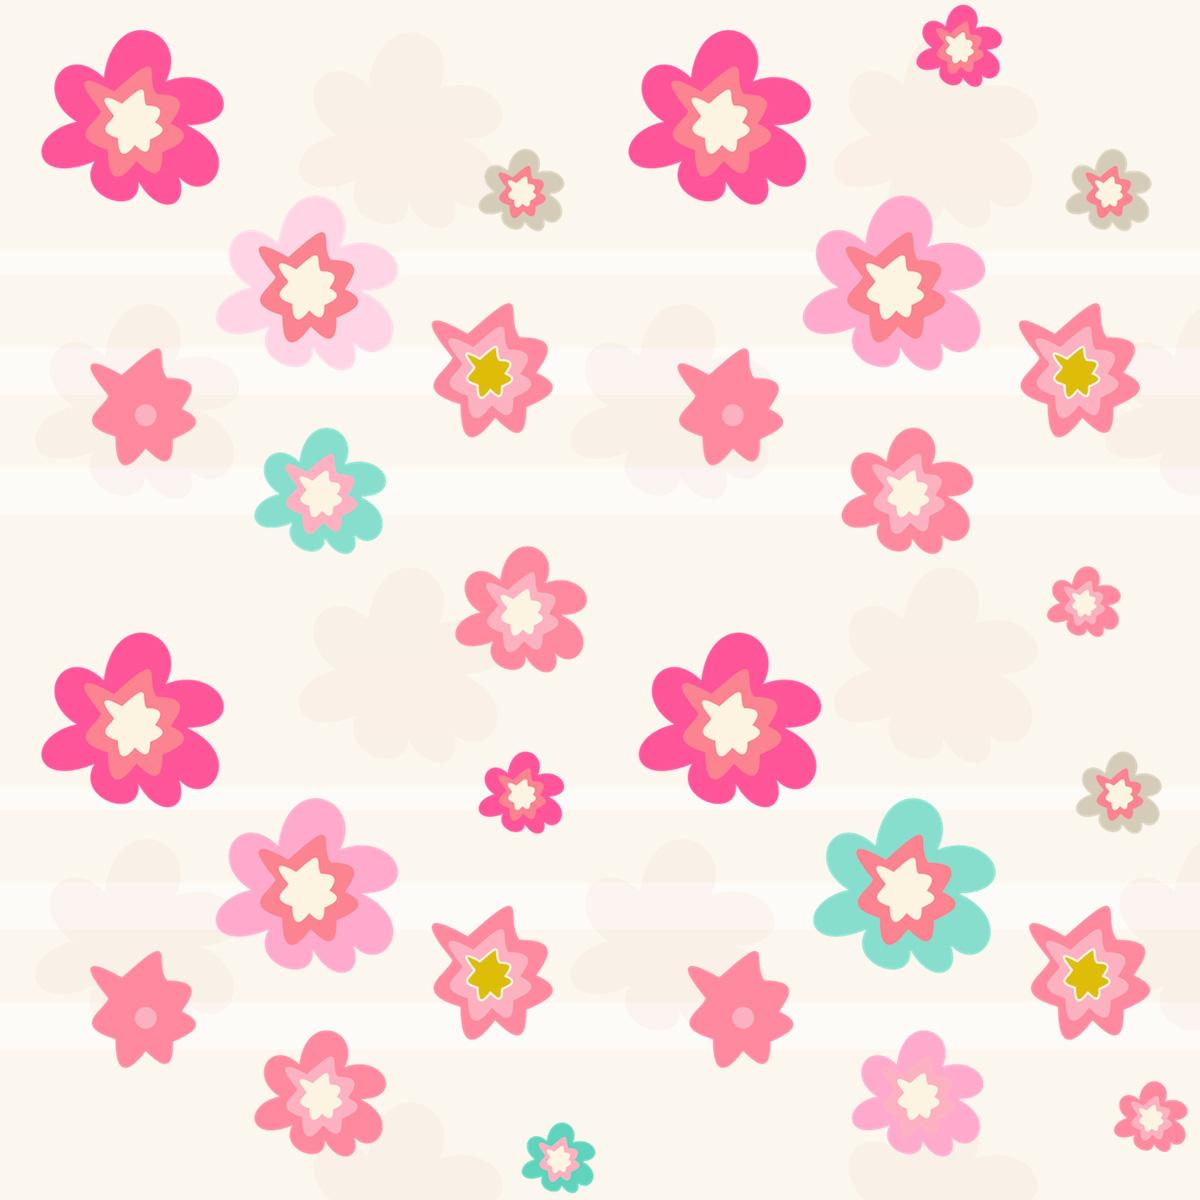 free digital floral scrapbooking paper in pink ausdruckbares geschenkpapier freebie. Black Bedroom Furniture Sets. Home Design Ideas